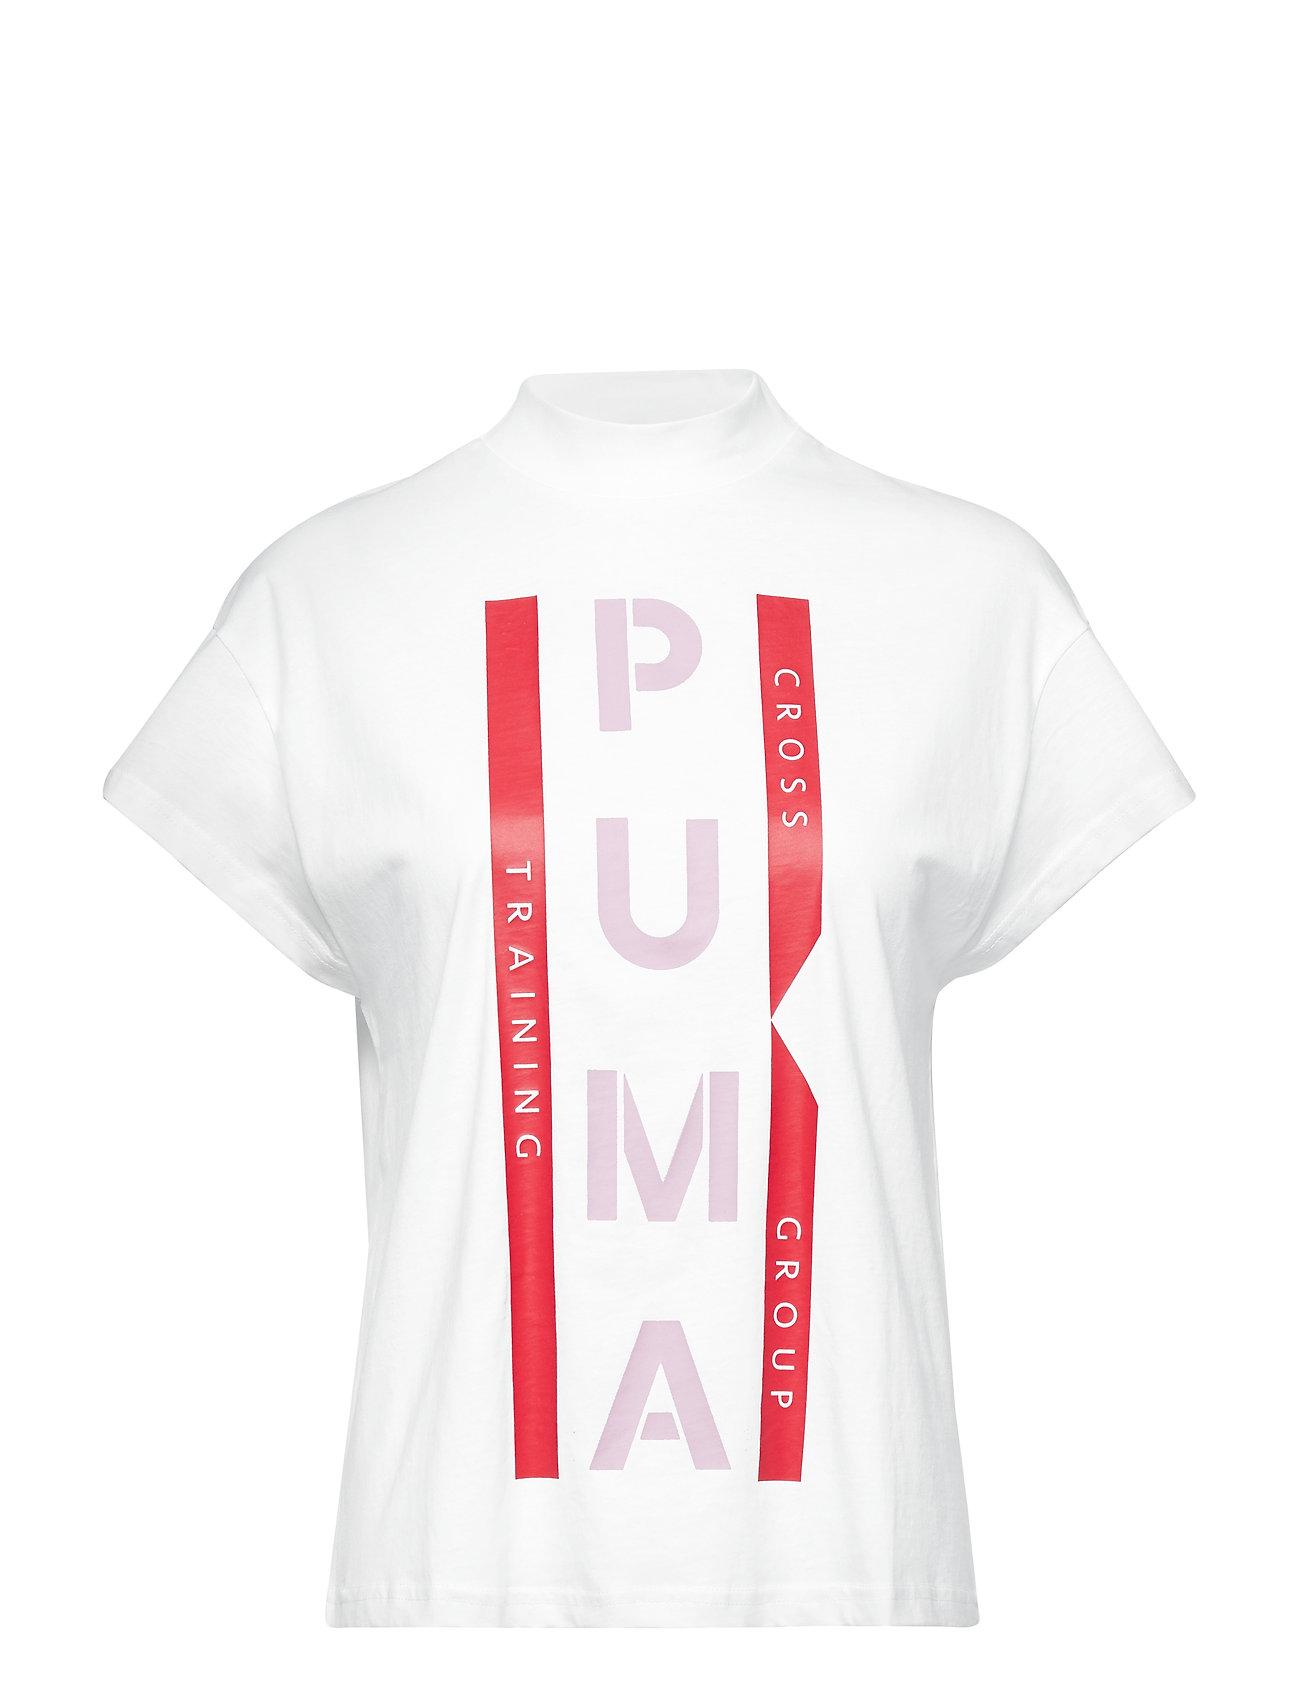 03c60359 Puma Xtg Graphic Tee (Puma White) (17.50 €) - PUMA -   Boozt.com